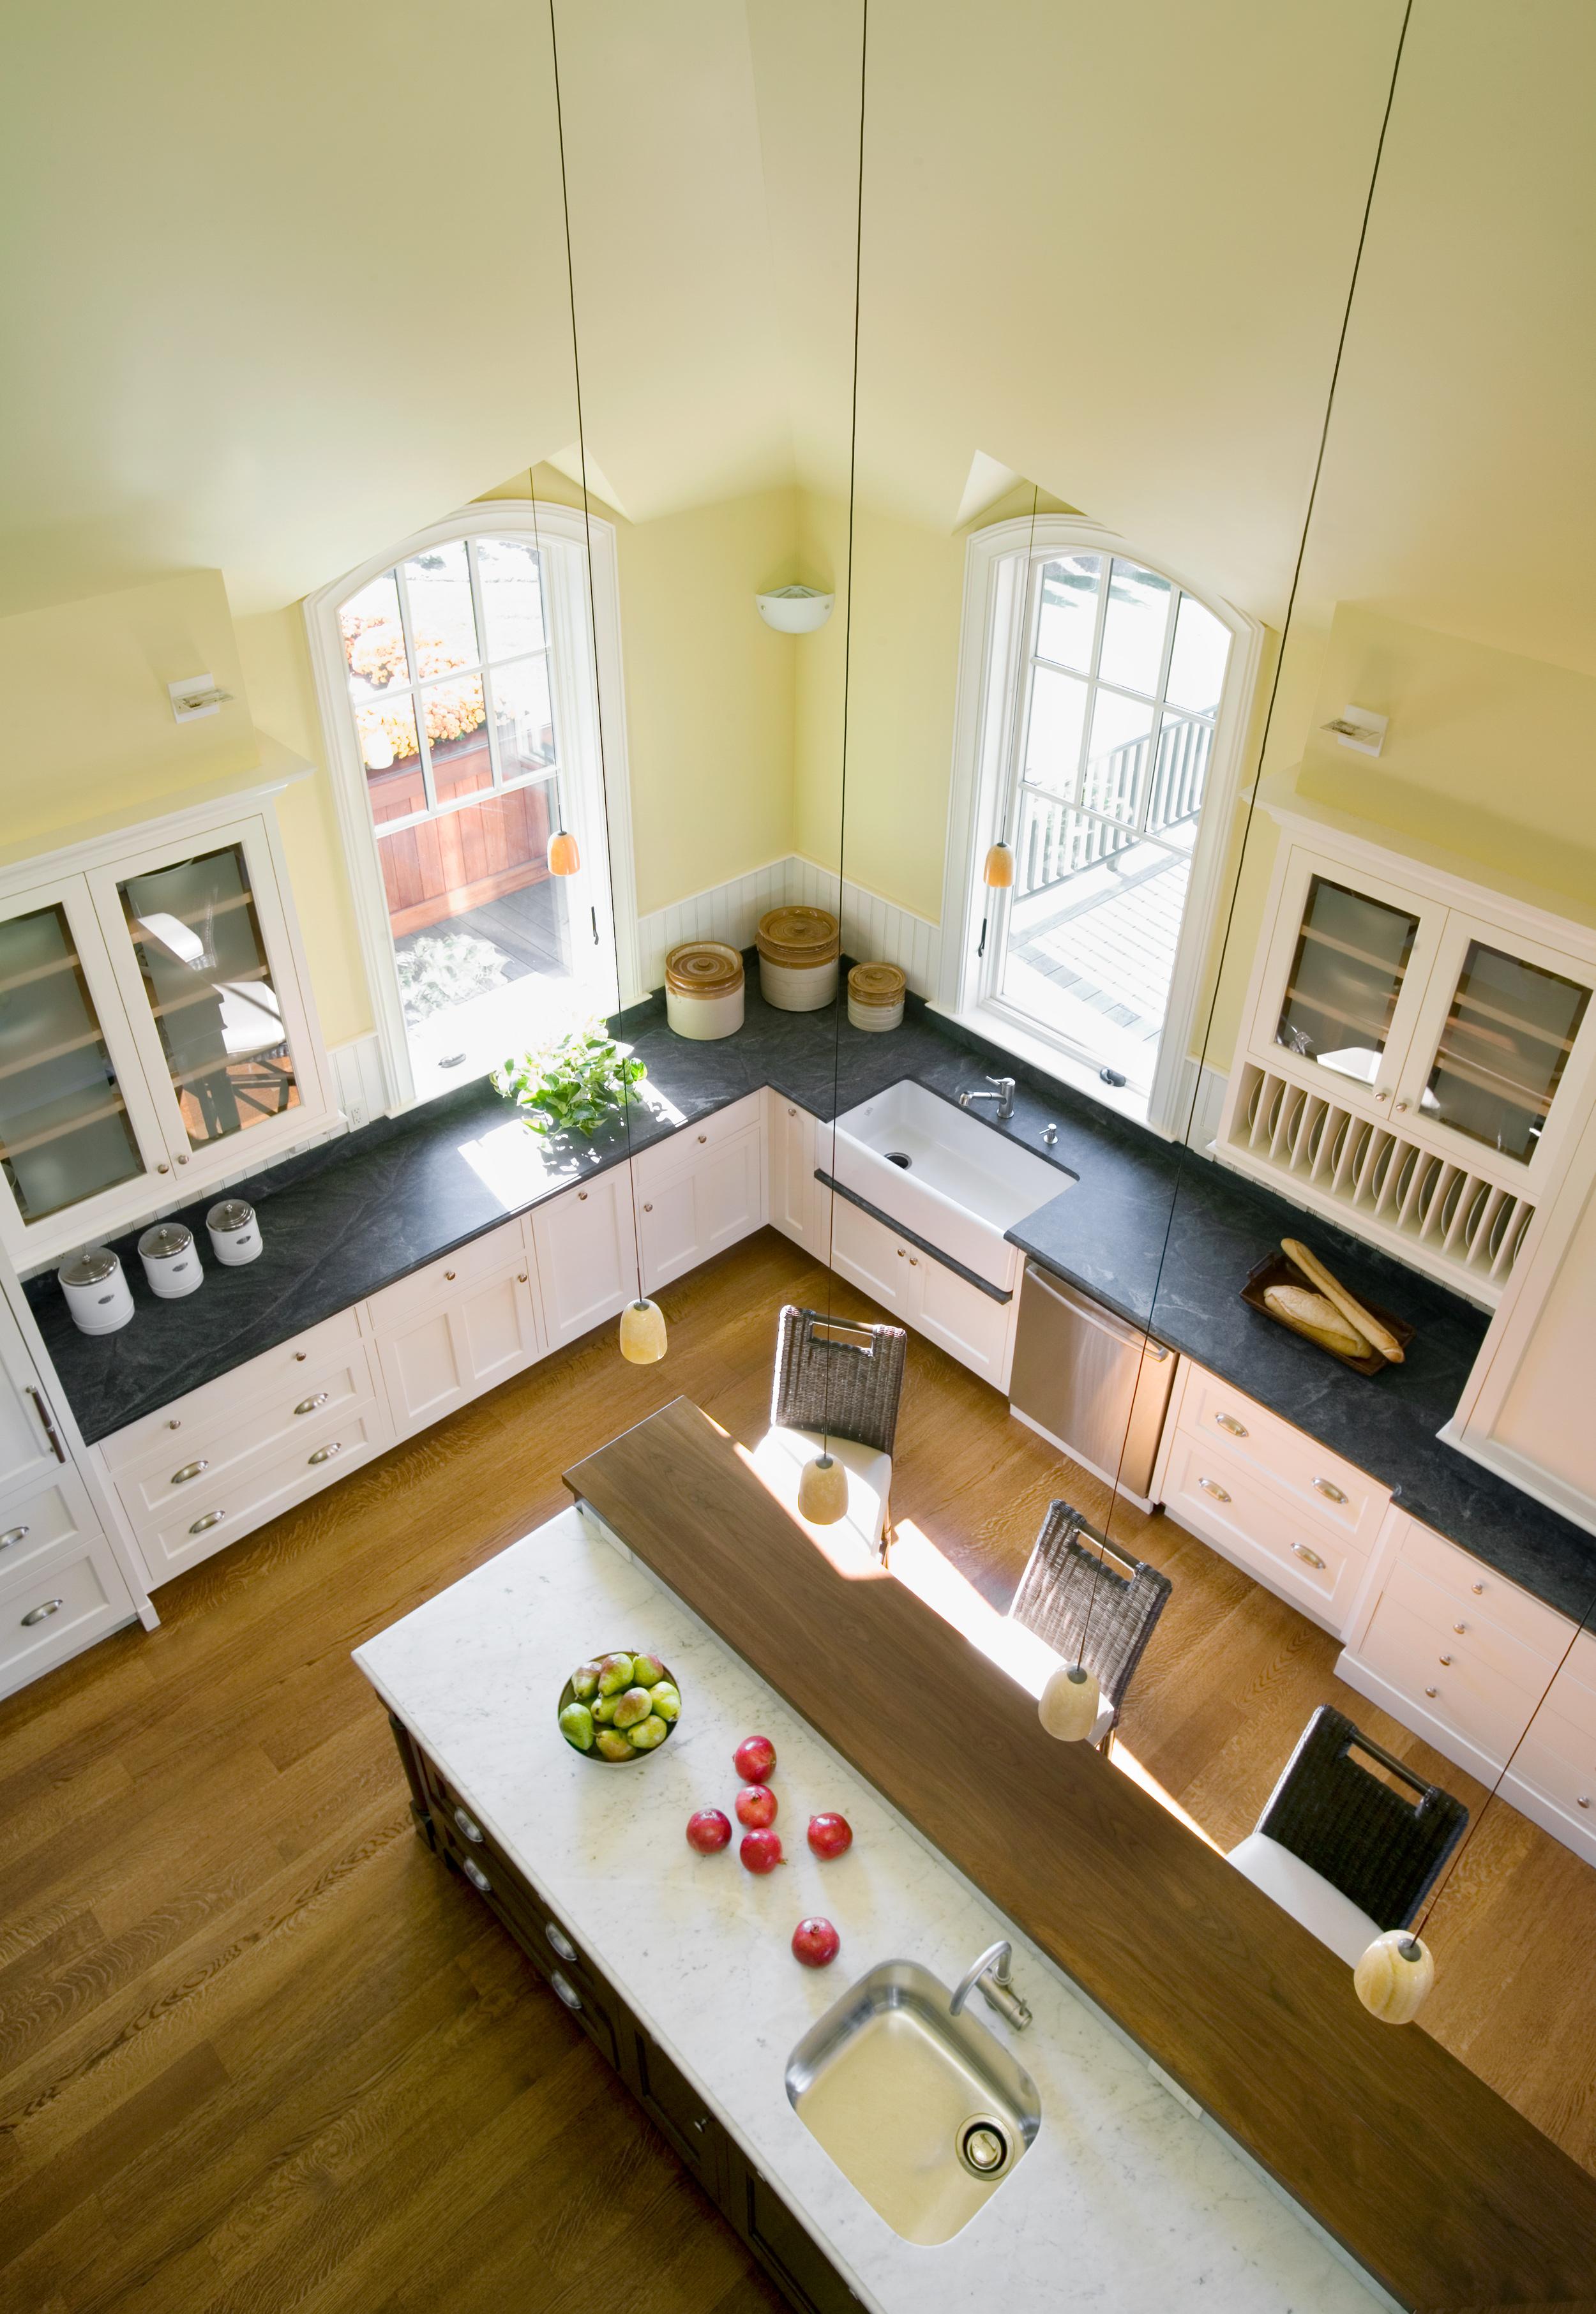 DNE_Doreve_RI_10_07_kitchen_from_above.jpg